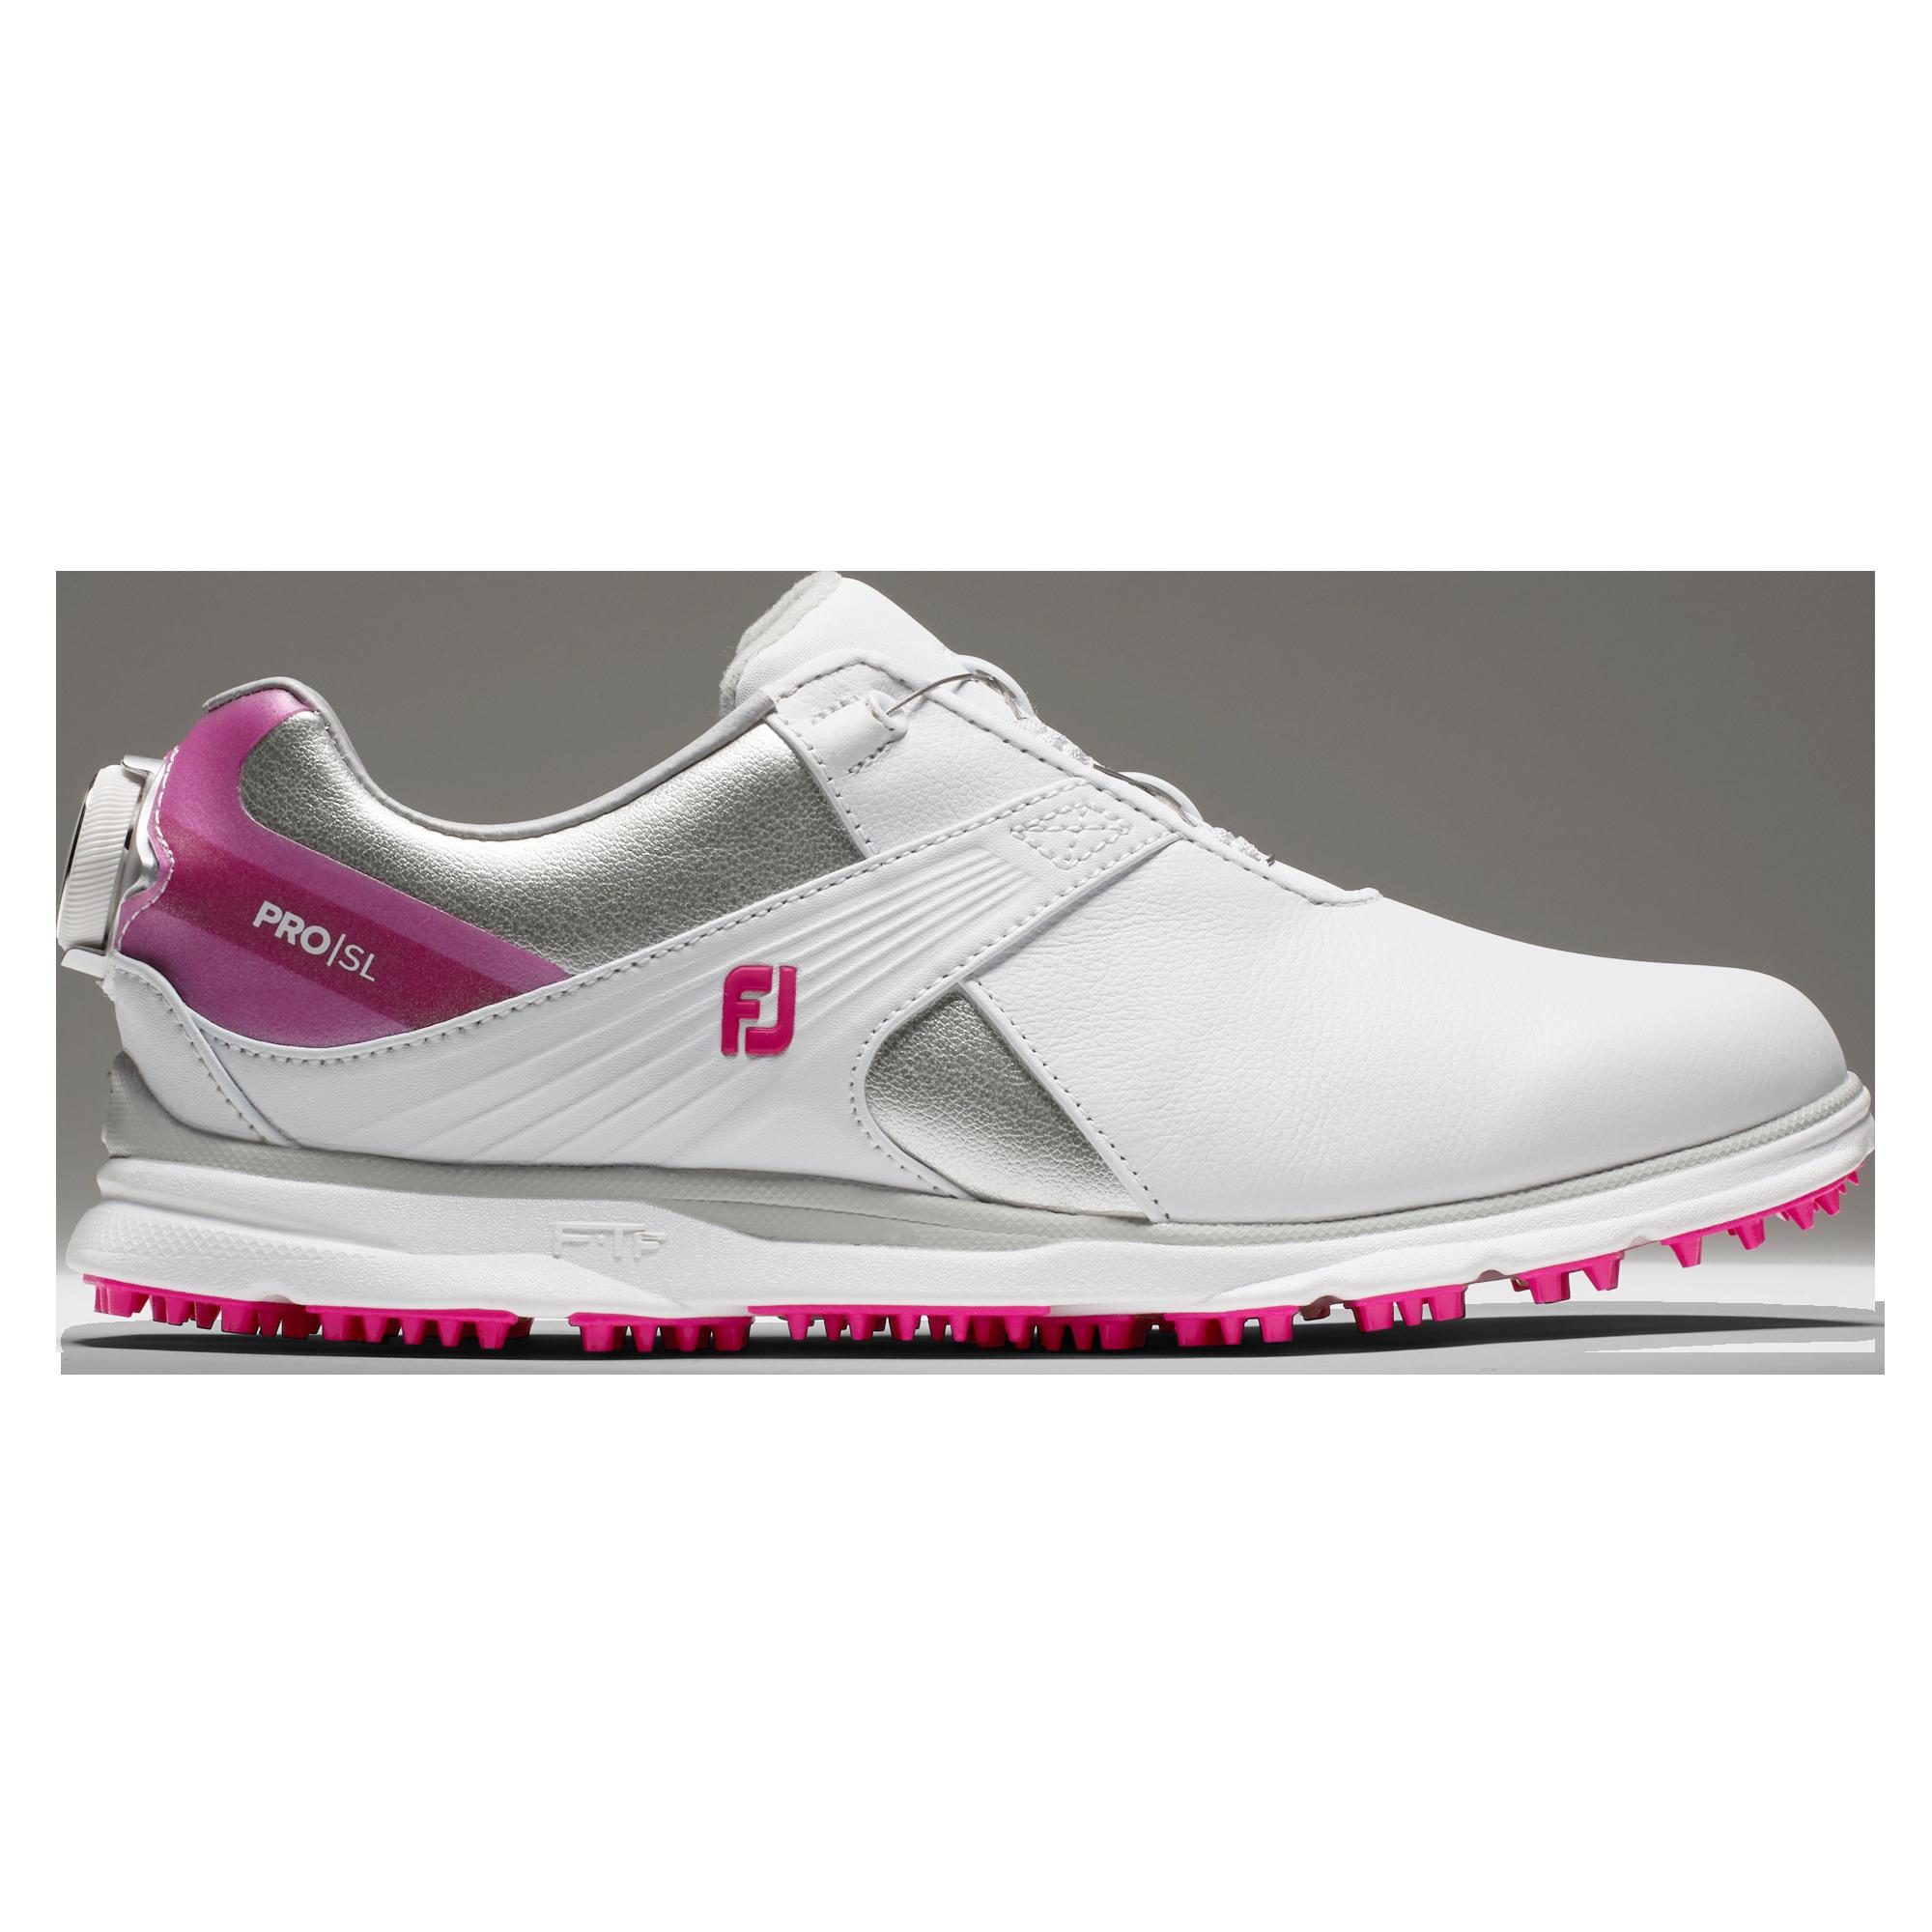 Women's Wide Golf Shoes   The #1 Shoe